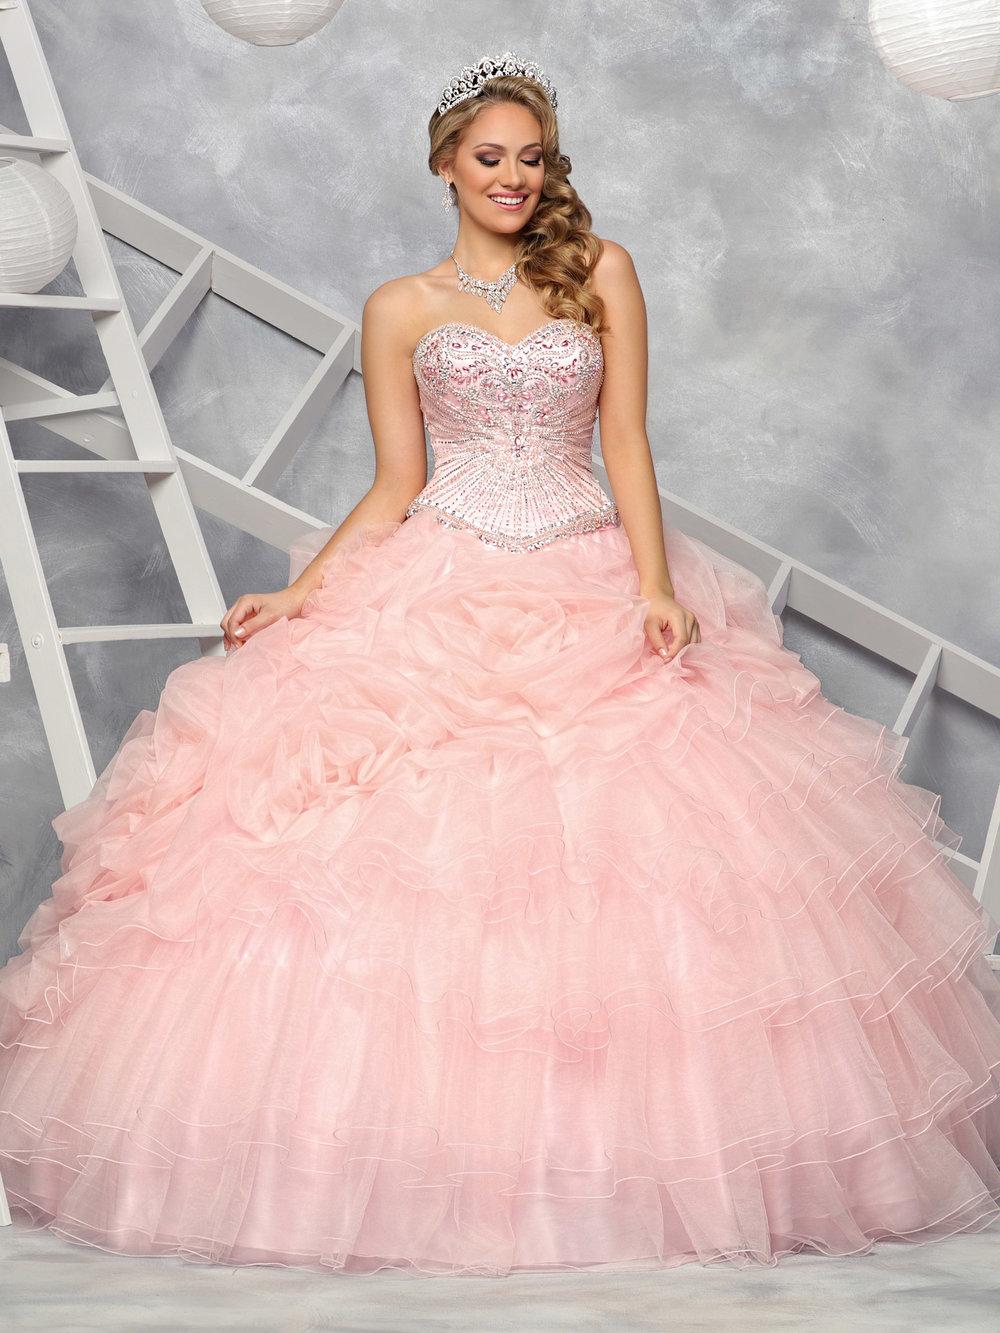 DaVinci Bridal A-line wedding gown style 50363